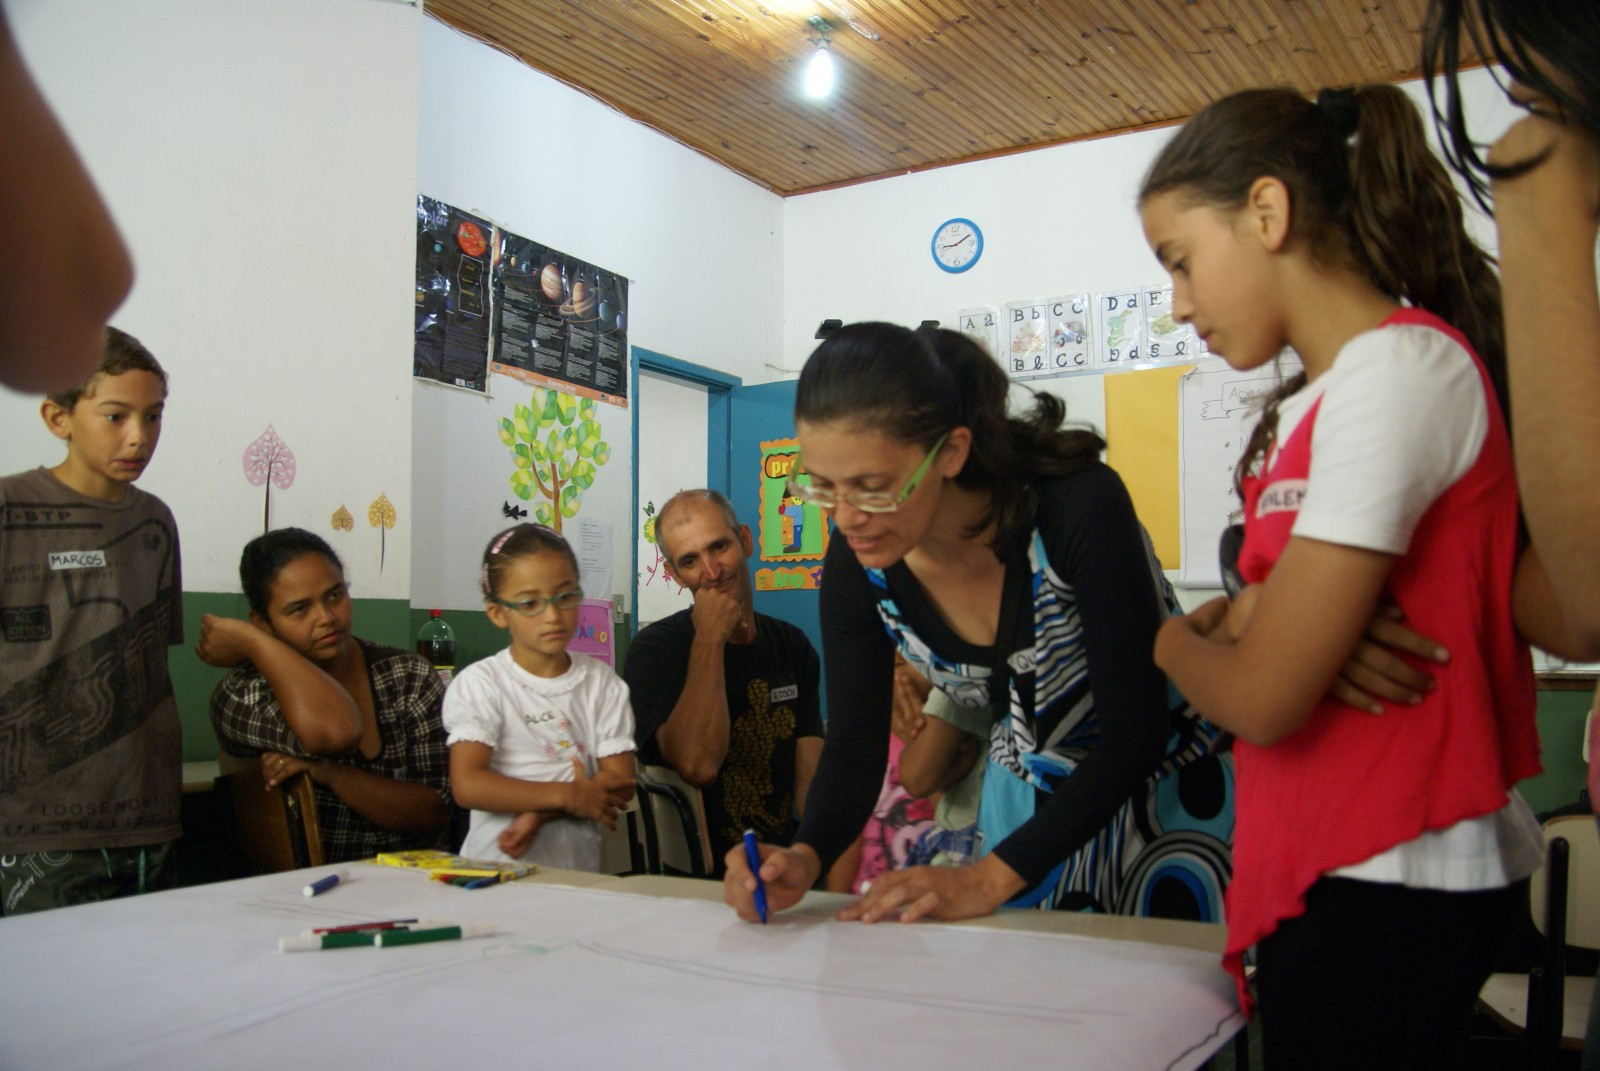 Resarch_MarketResearch_Focus group discussion_Brazil_2